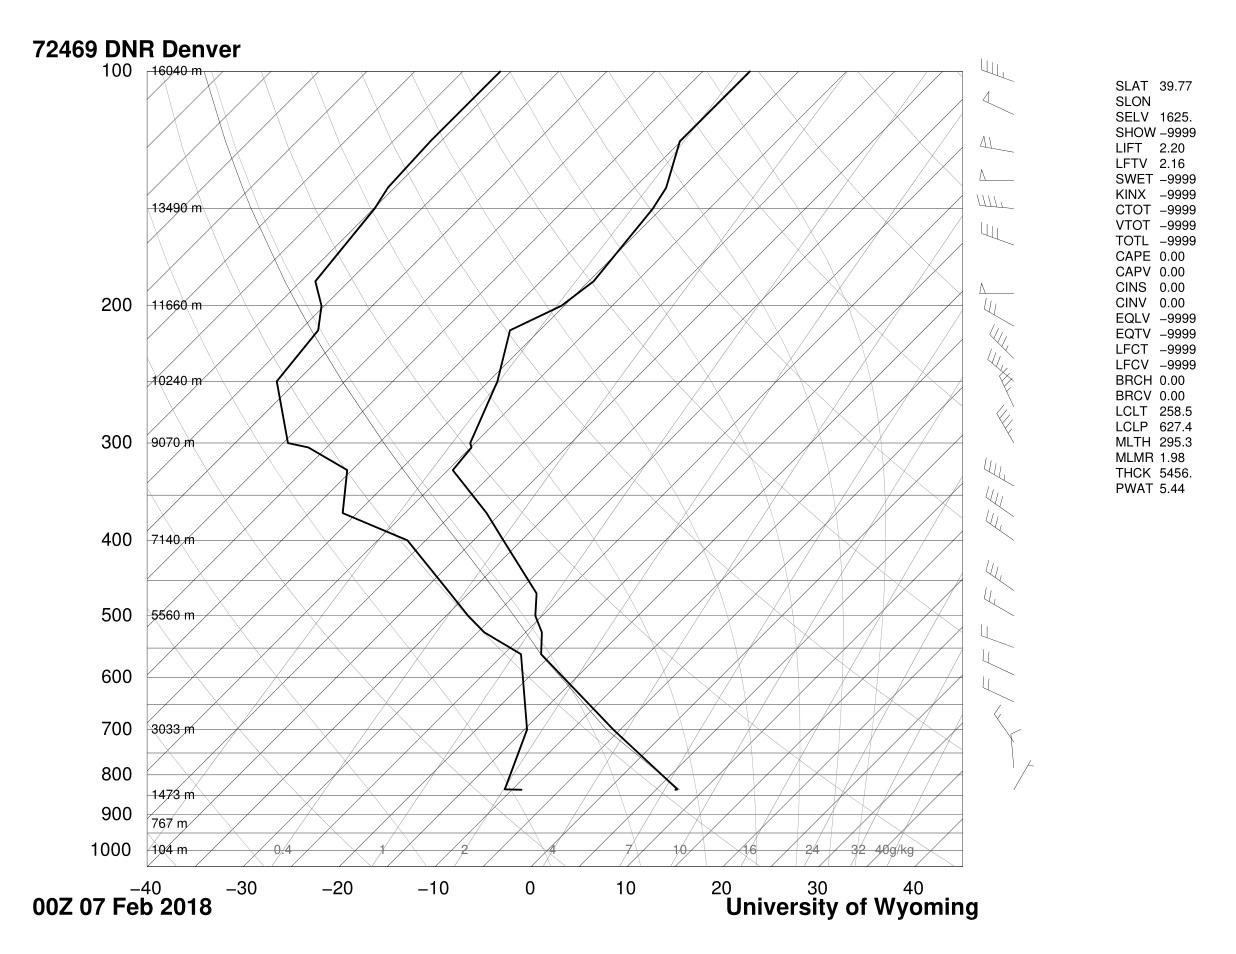 Cade Haley Cloud First Flow Visualization